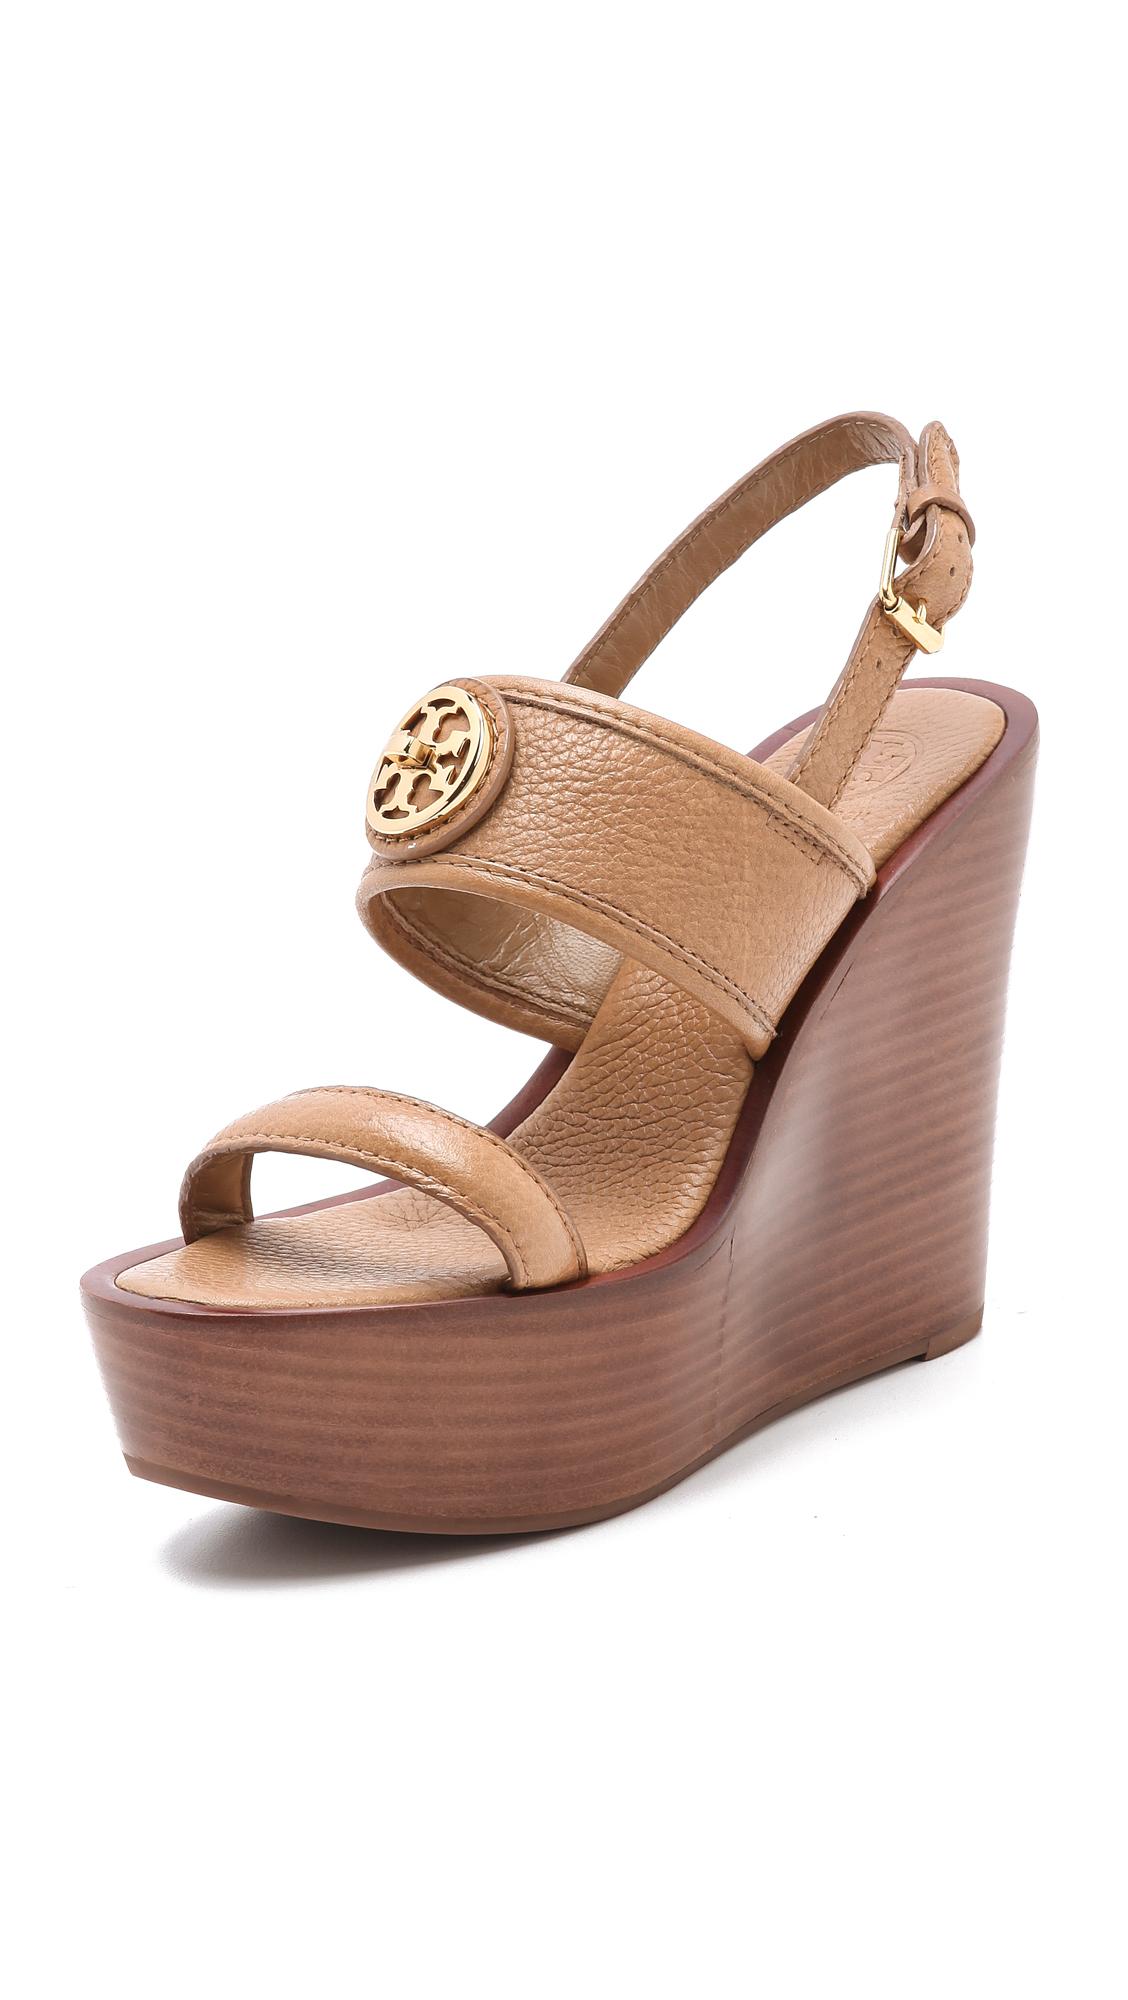 18b9a3c8f2c8eb Lyst - Tory Burch Selma Wedge Sandals in Brown